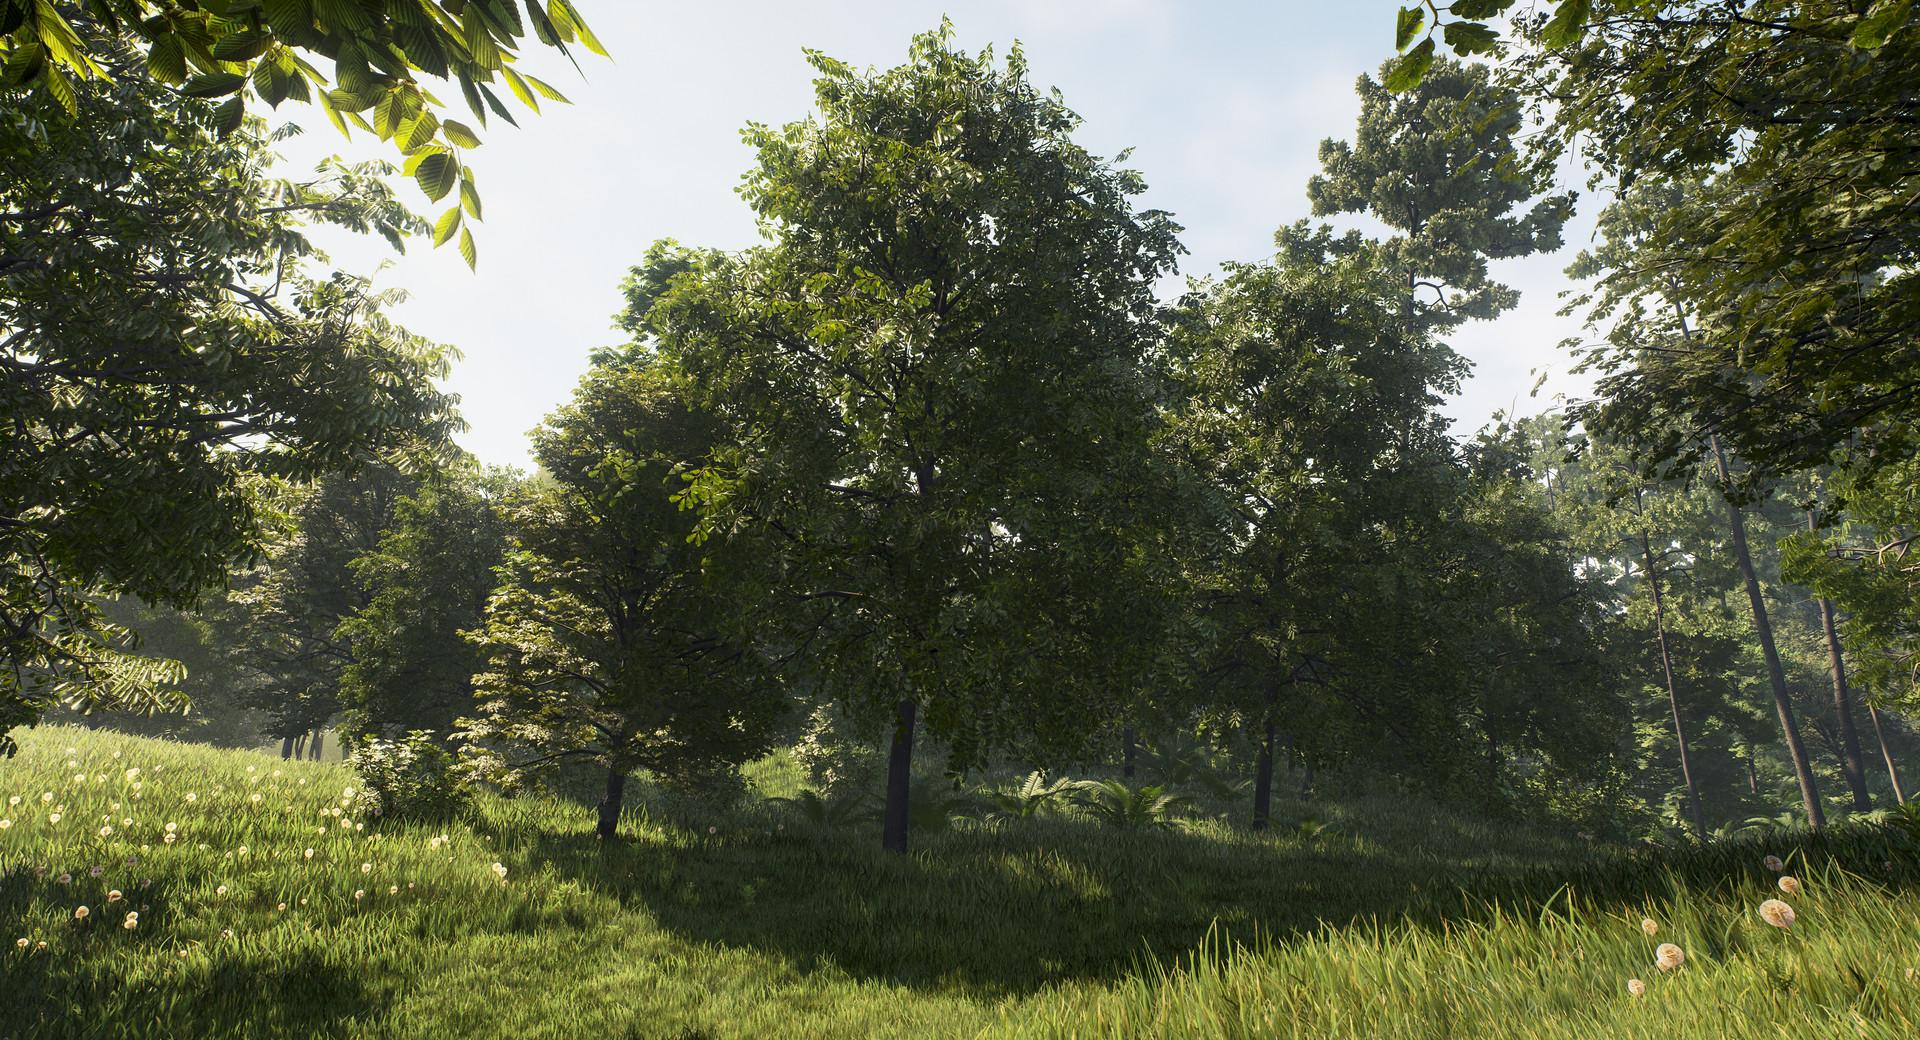 ArtStation - Archmodels for Unreal Engine vol  4, Tomasz Kawecki